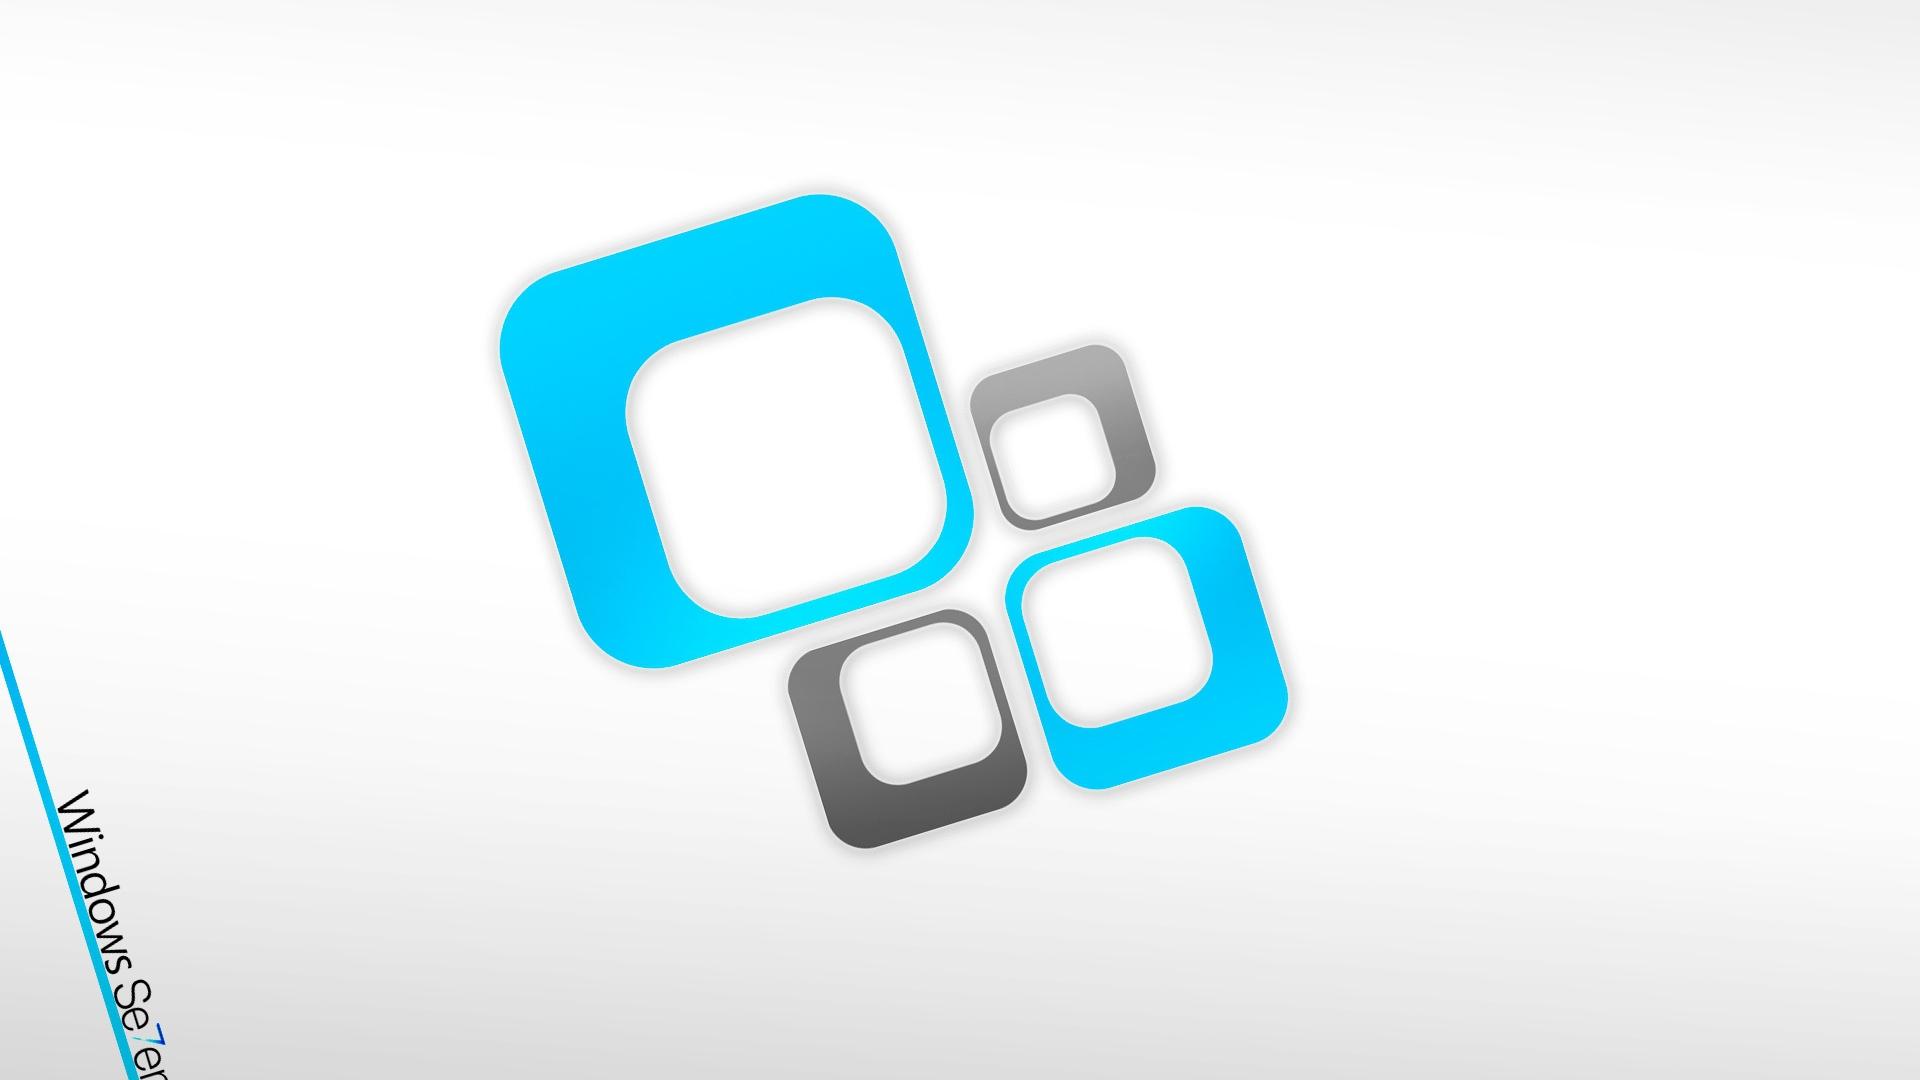 Windows 7 Blue White Gray 30978 1920x1080